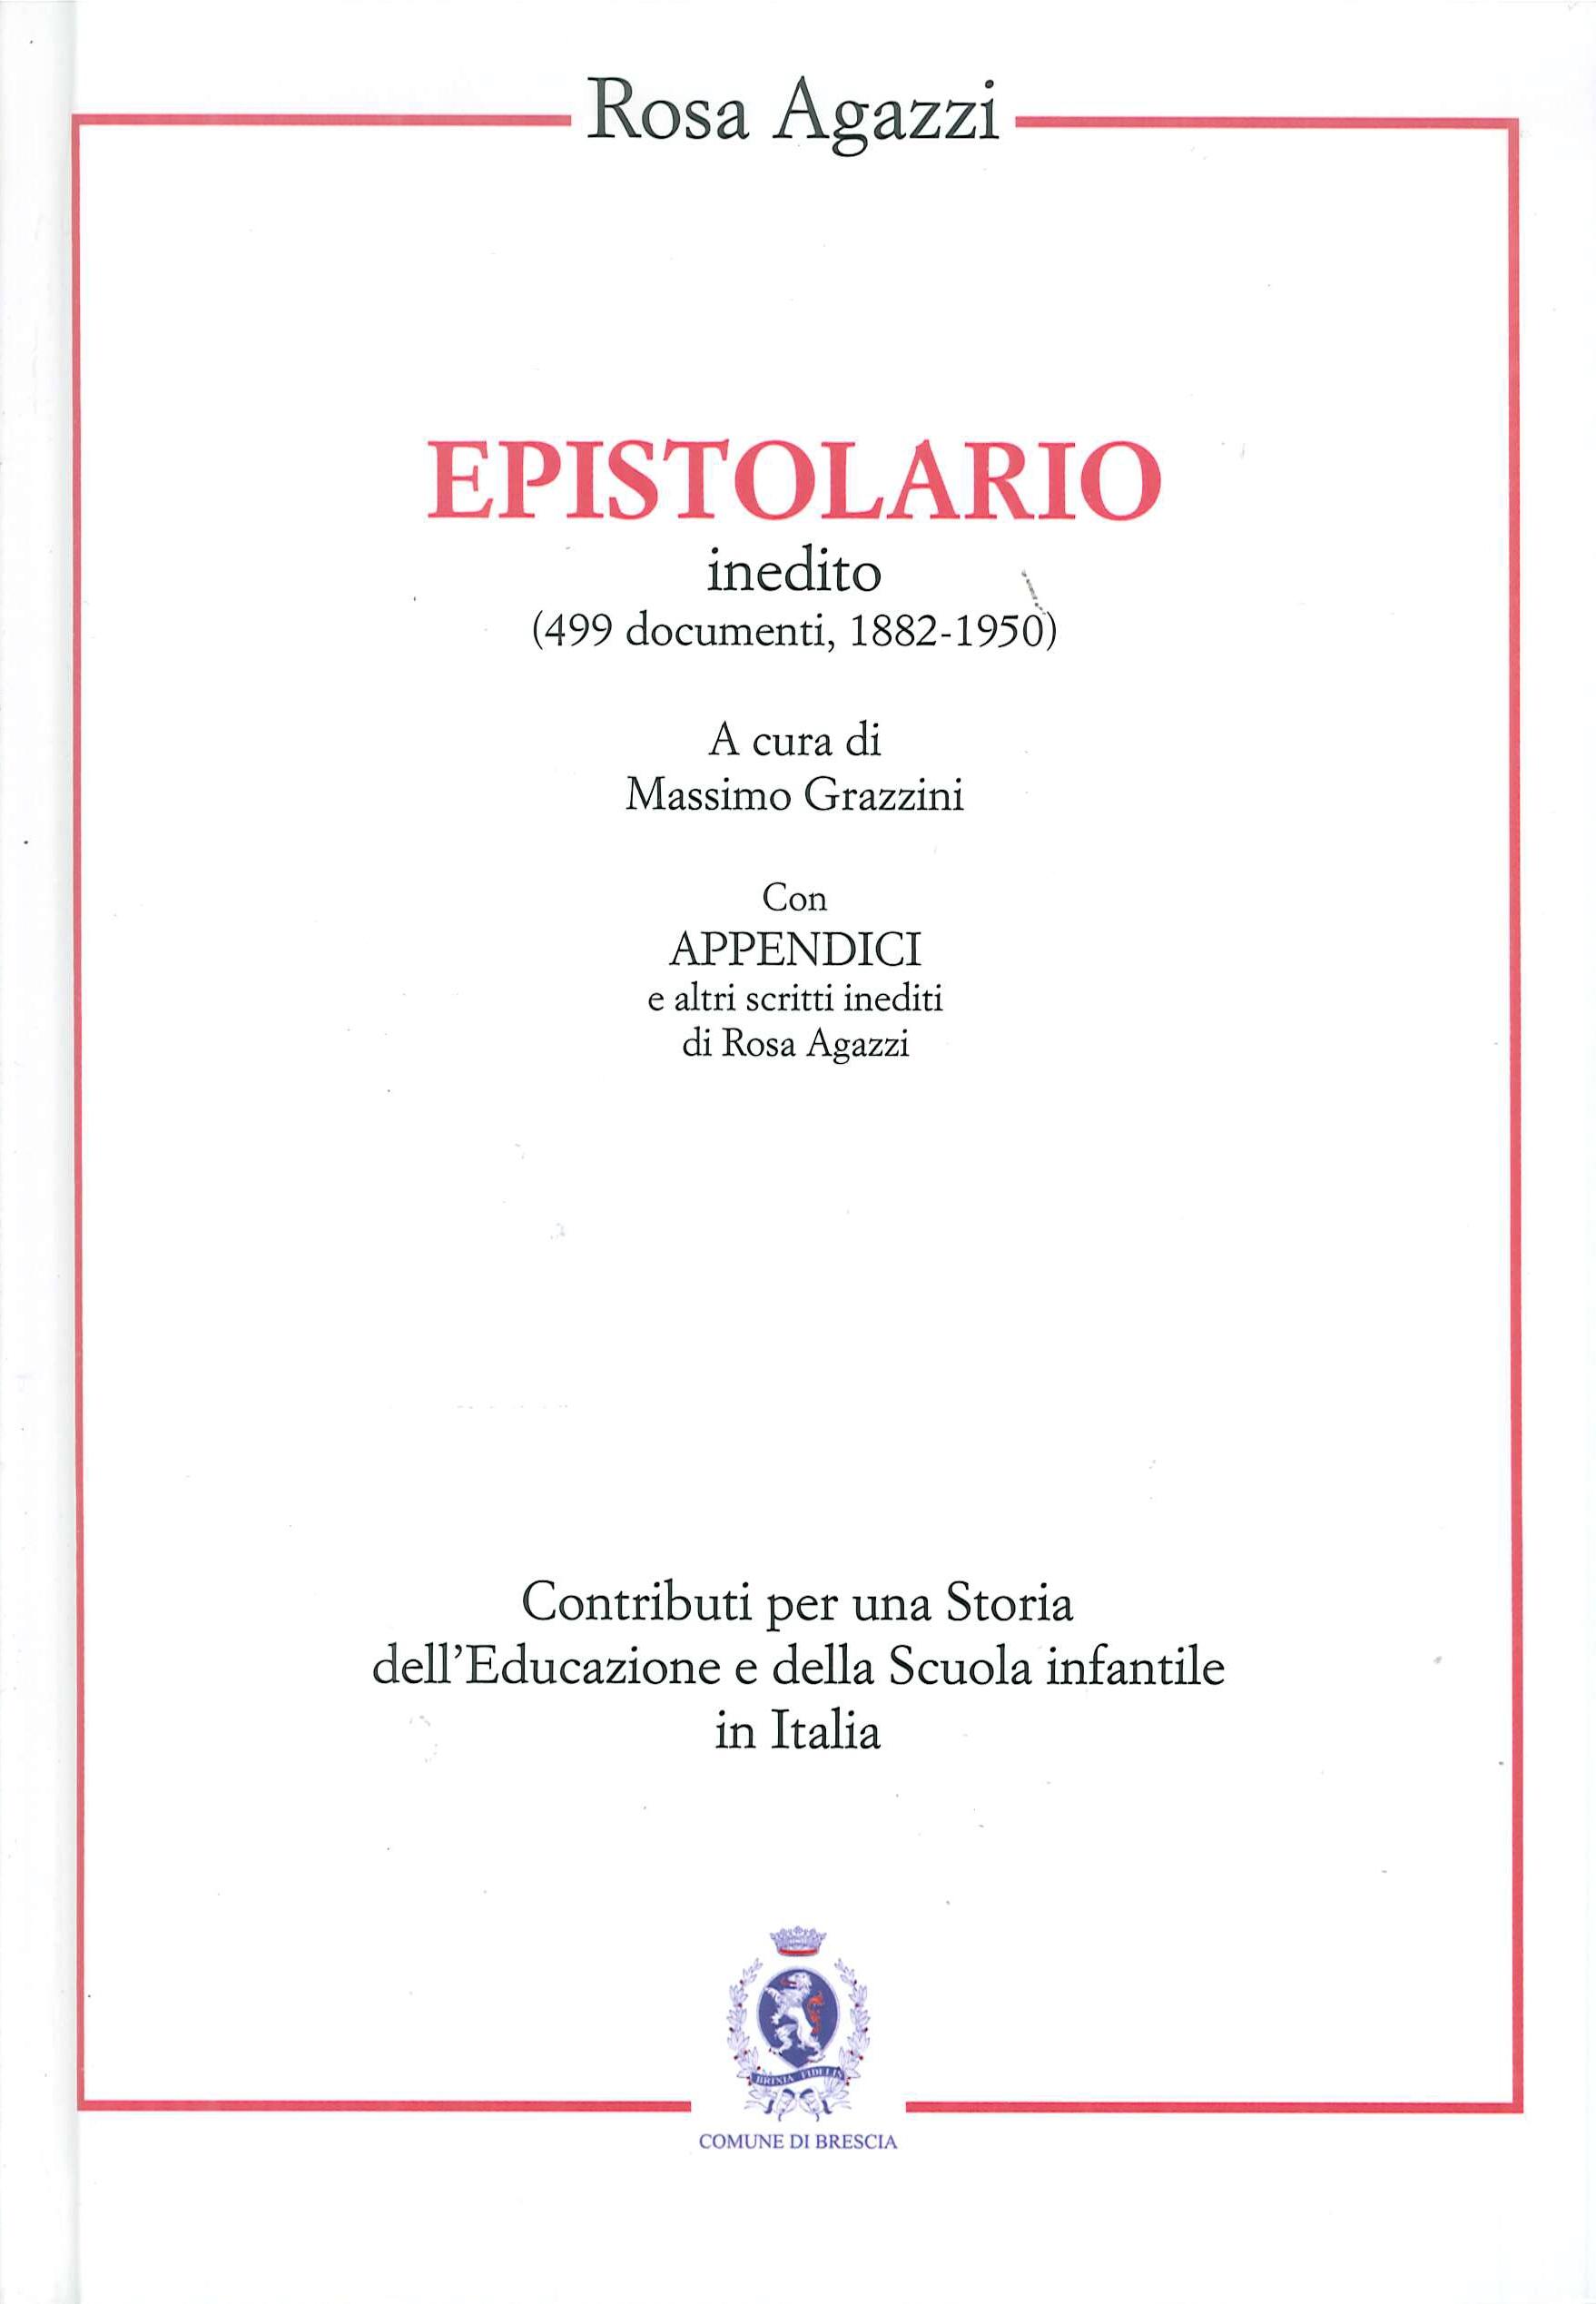 Rosa Agazzi. Epistolario inedito. 1882-1950